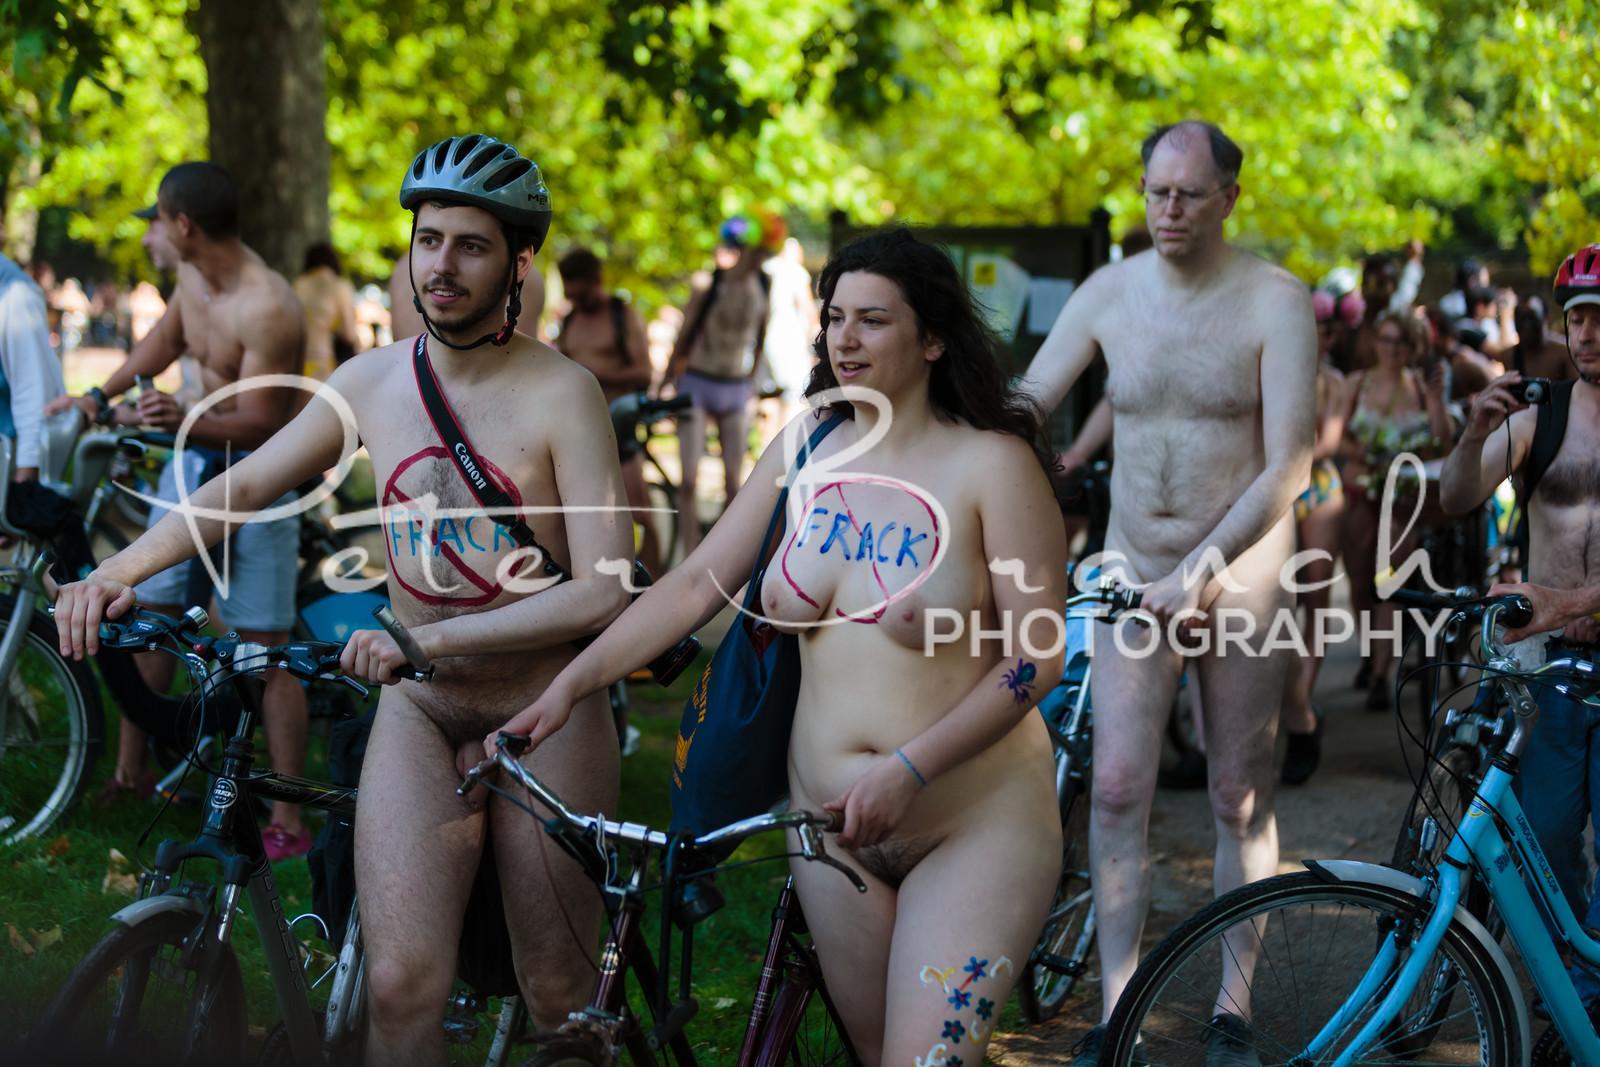 Wnbr London World Naked Bike Ride 2014  Peterbphotos-2840